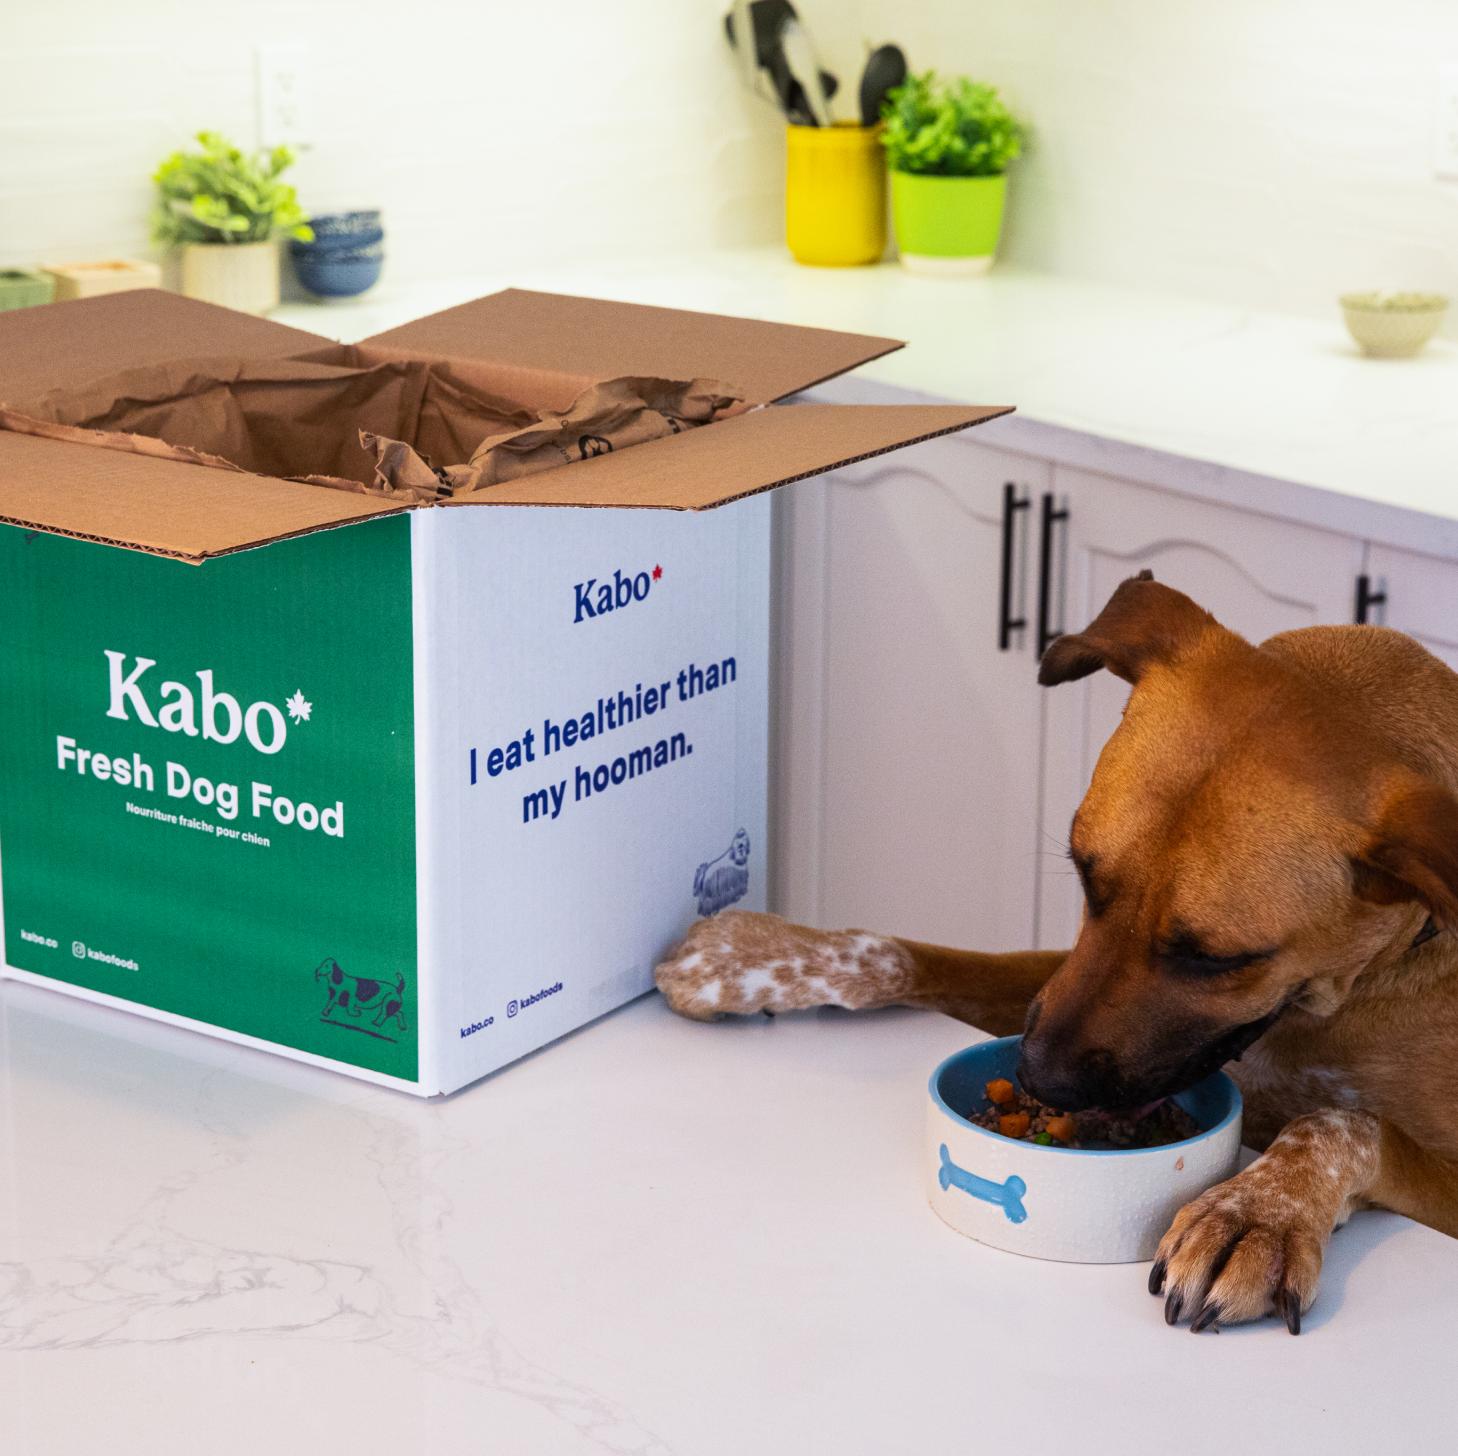 Kabo dog eating Kabo fresh dog food on kitchen counter